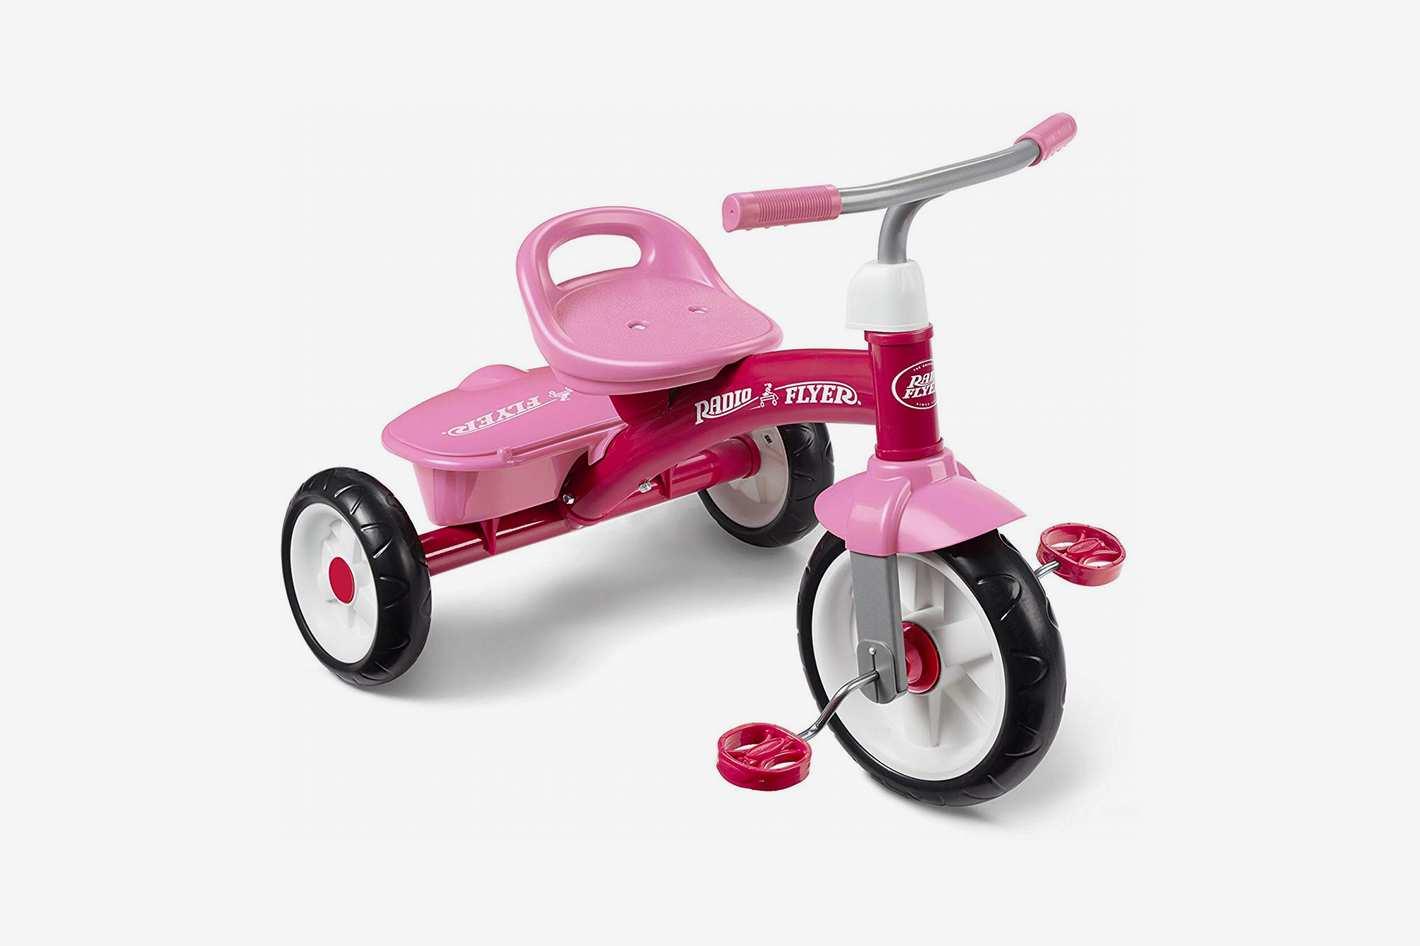 Radio Flyer Rider Trike Ride On, Pink